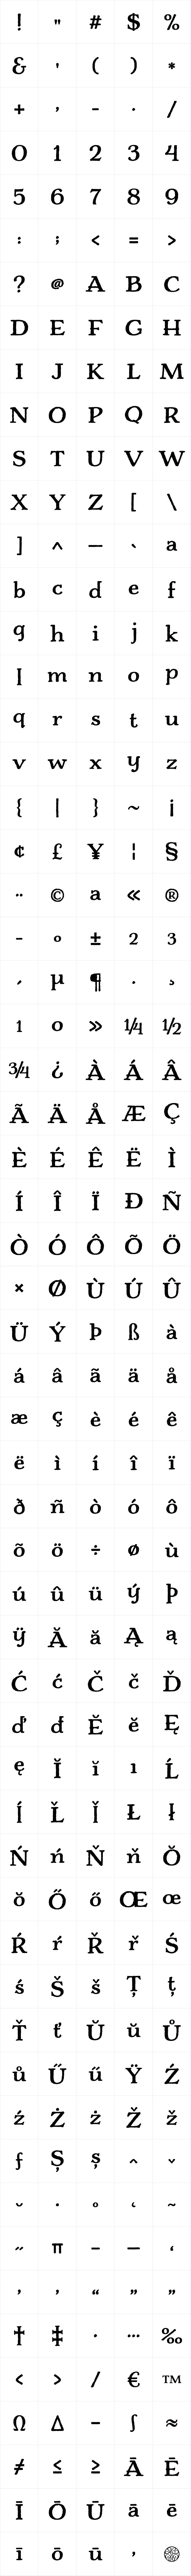 Charcuterie Serif Bold